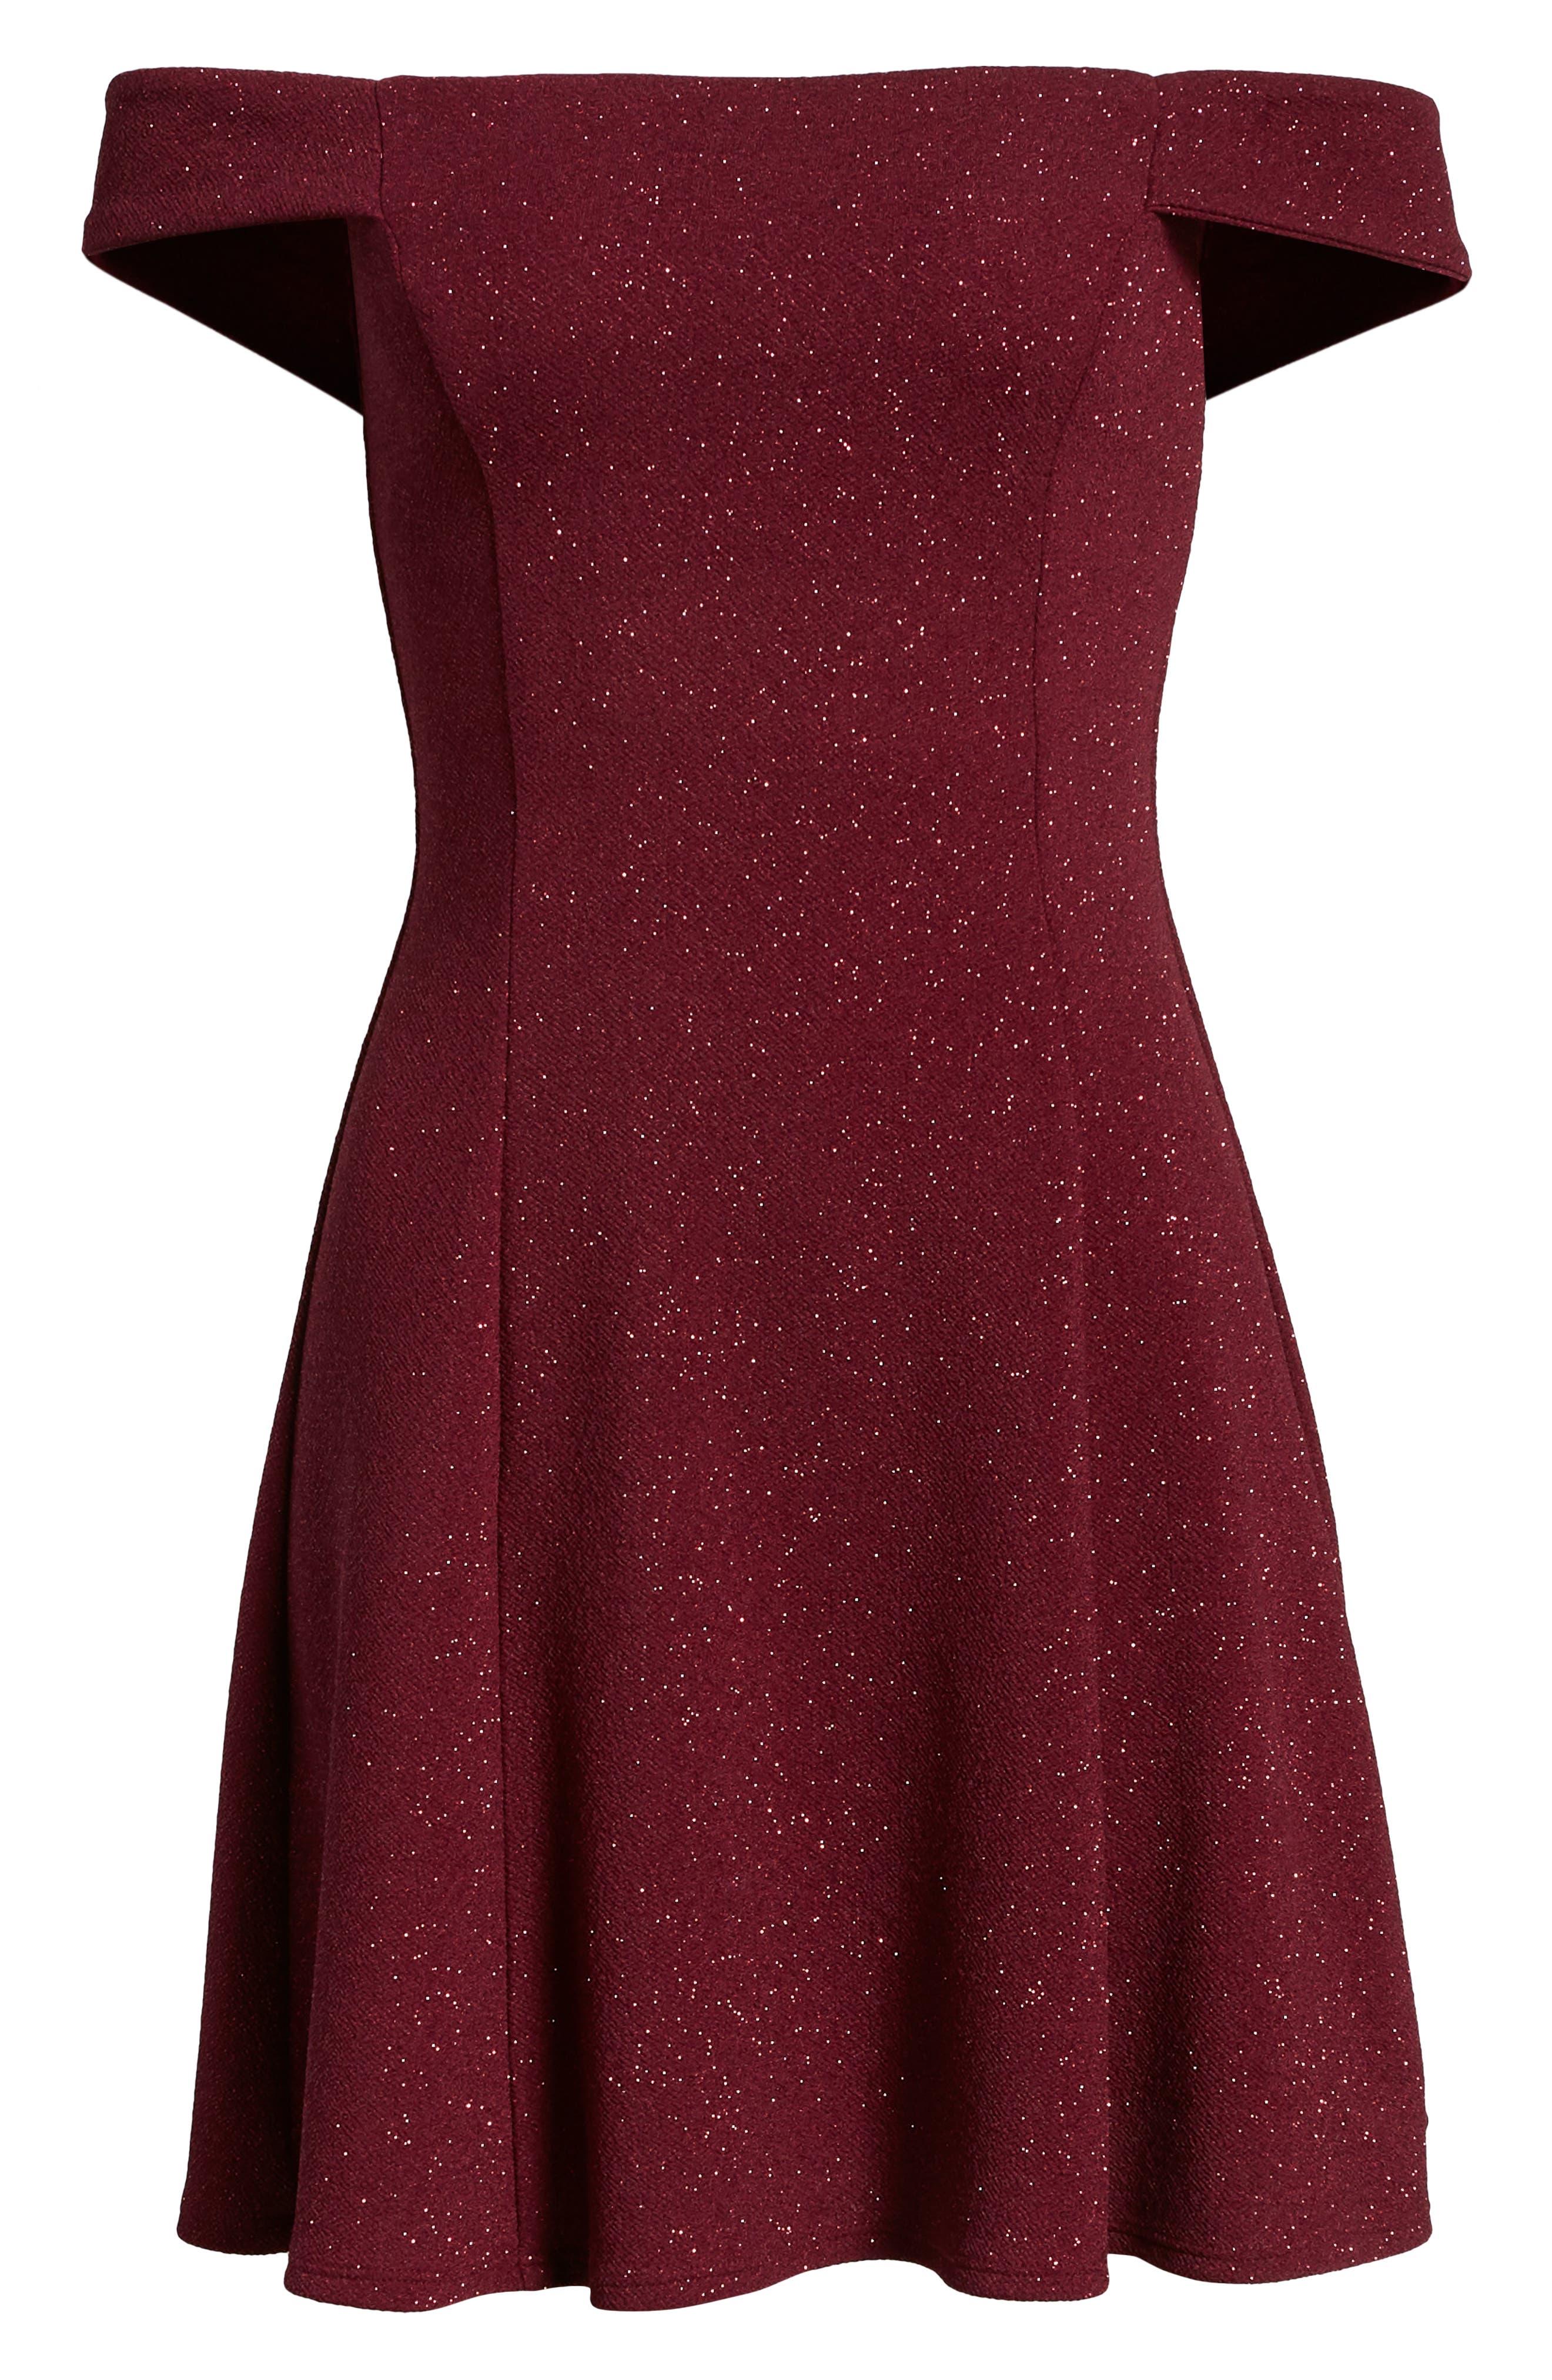 Glitter Off the Shoulder Dress,                             Alternate thumbnail 7, color,                             BURGUNDY